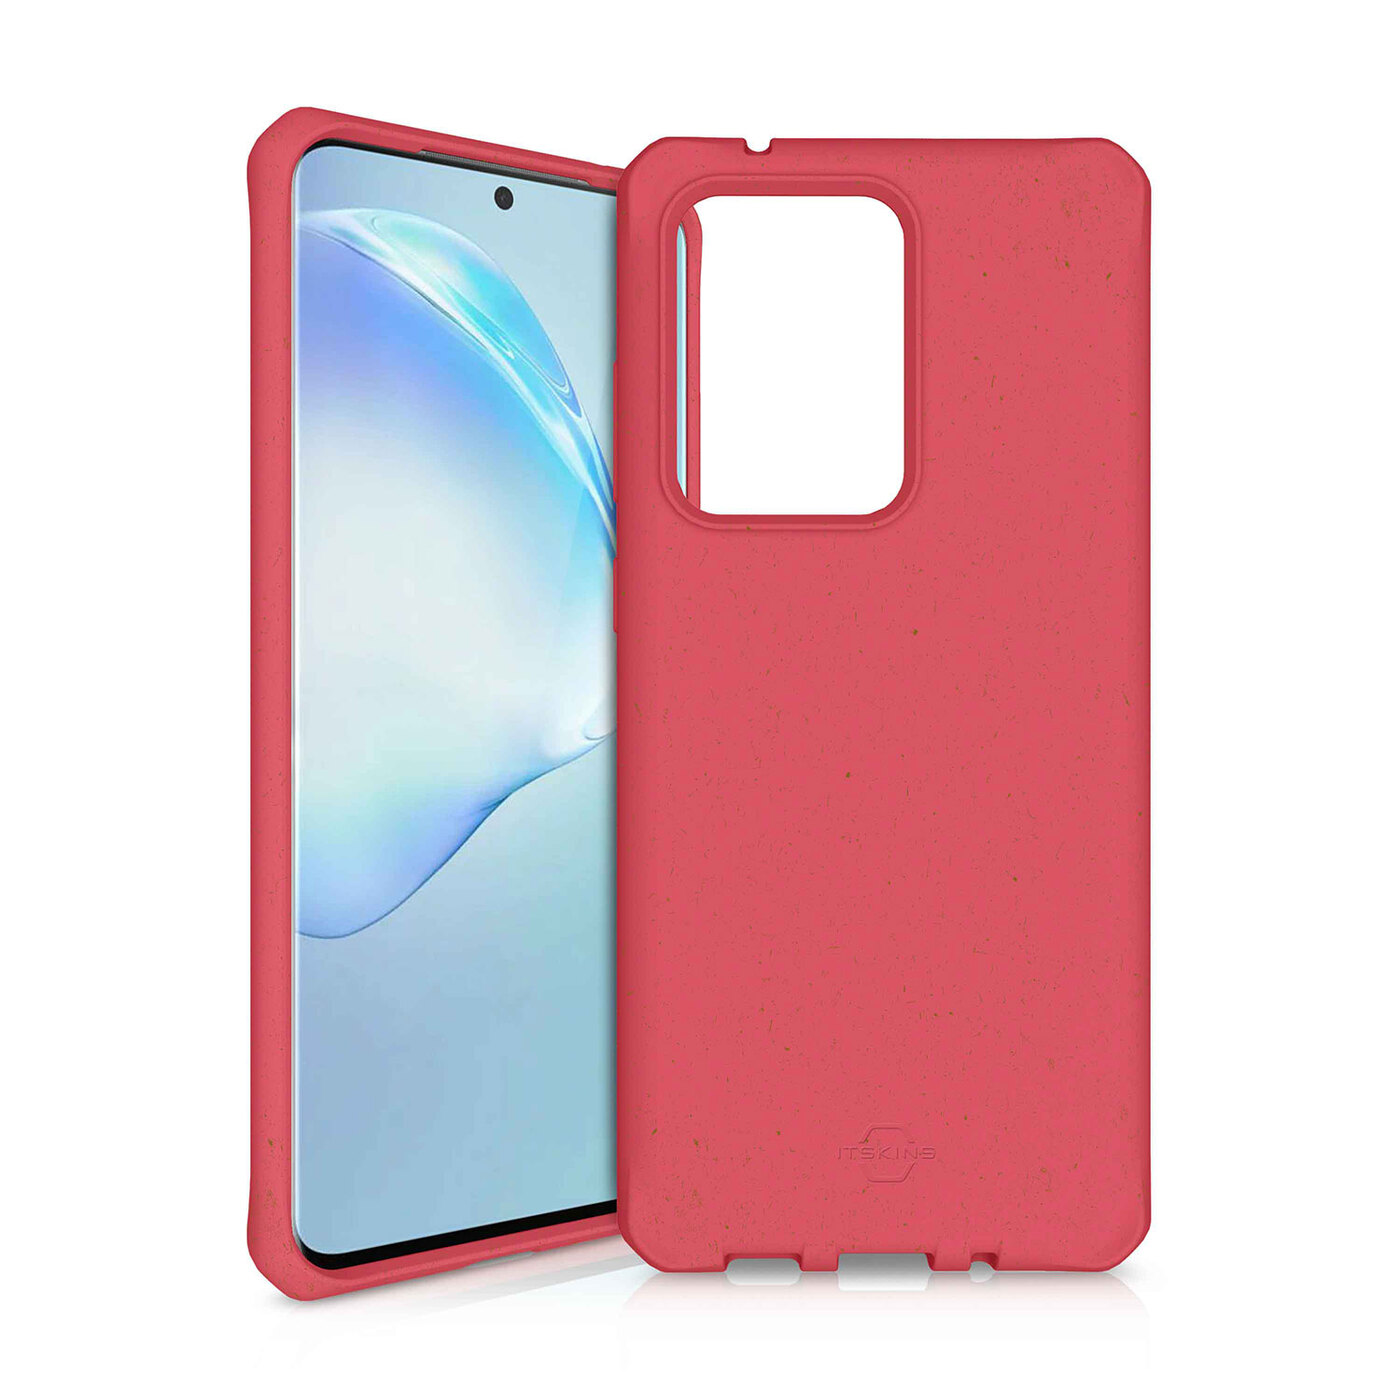 Чехол-накладка ITSKINS FERONIA BIO для Samsung Galaxy S20 Ultra, красный